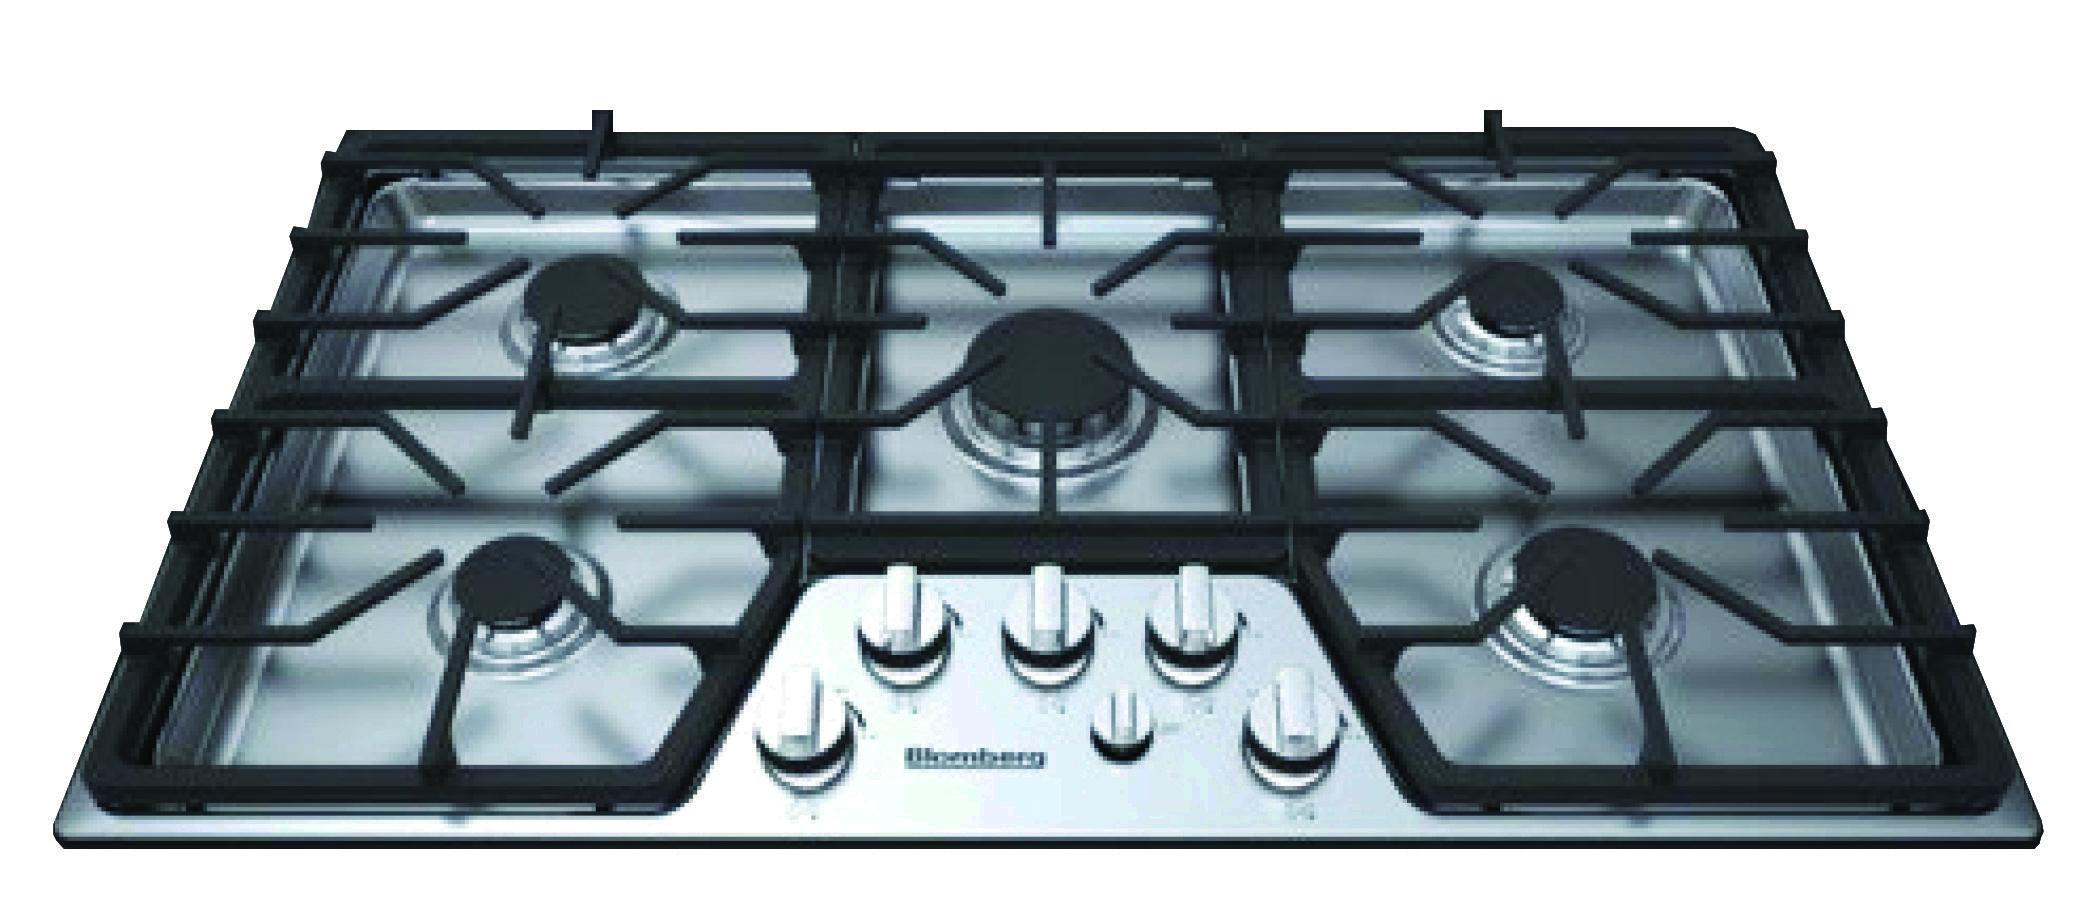 36in gas cooktop, 5 burner